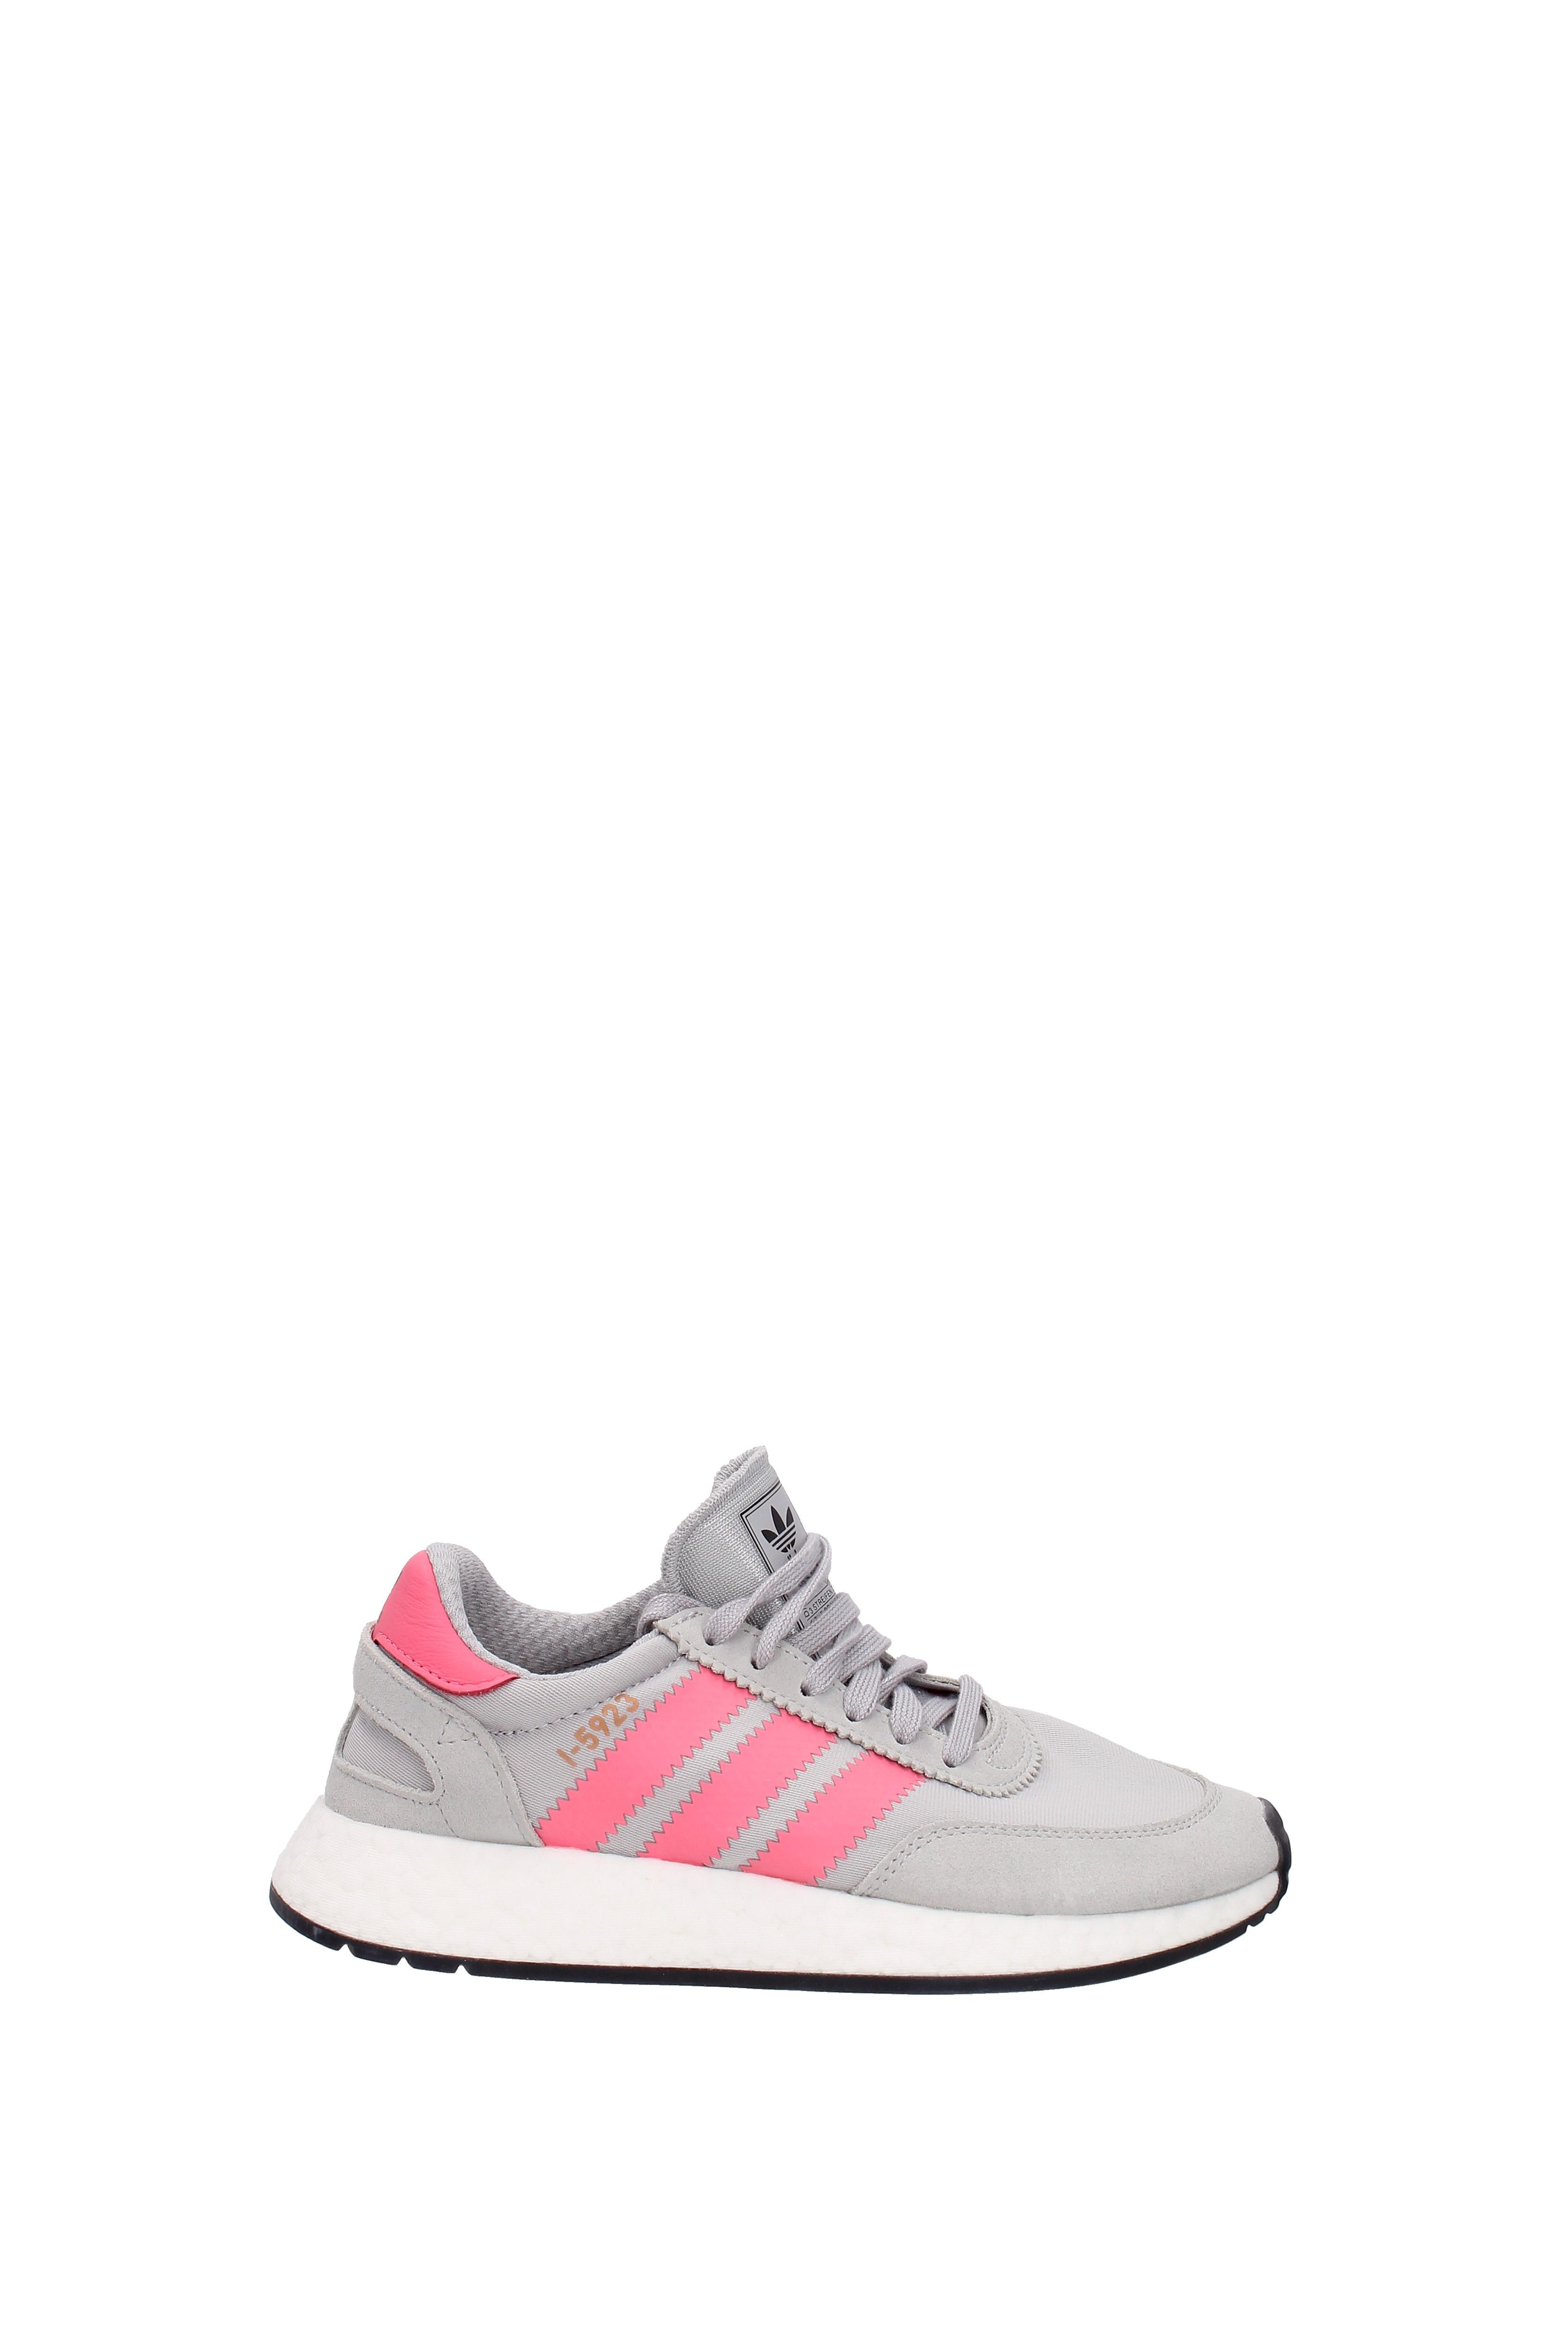 Sneakers Adidas - i 5923 w Women - Adidas Fabric  (CQ252) a5e21c